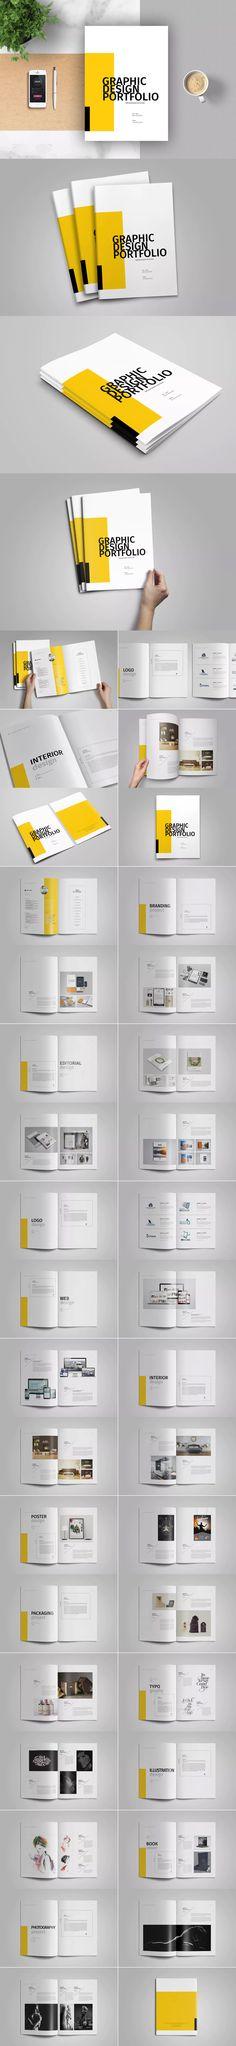 Graphic Design Portfolio Template  InDesign INDD - A4 and Us Letter Size #unlimiteddownloads